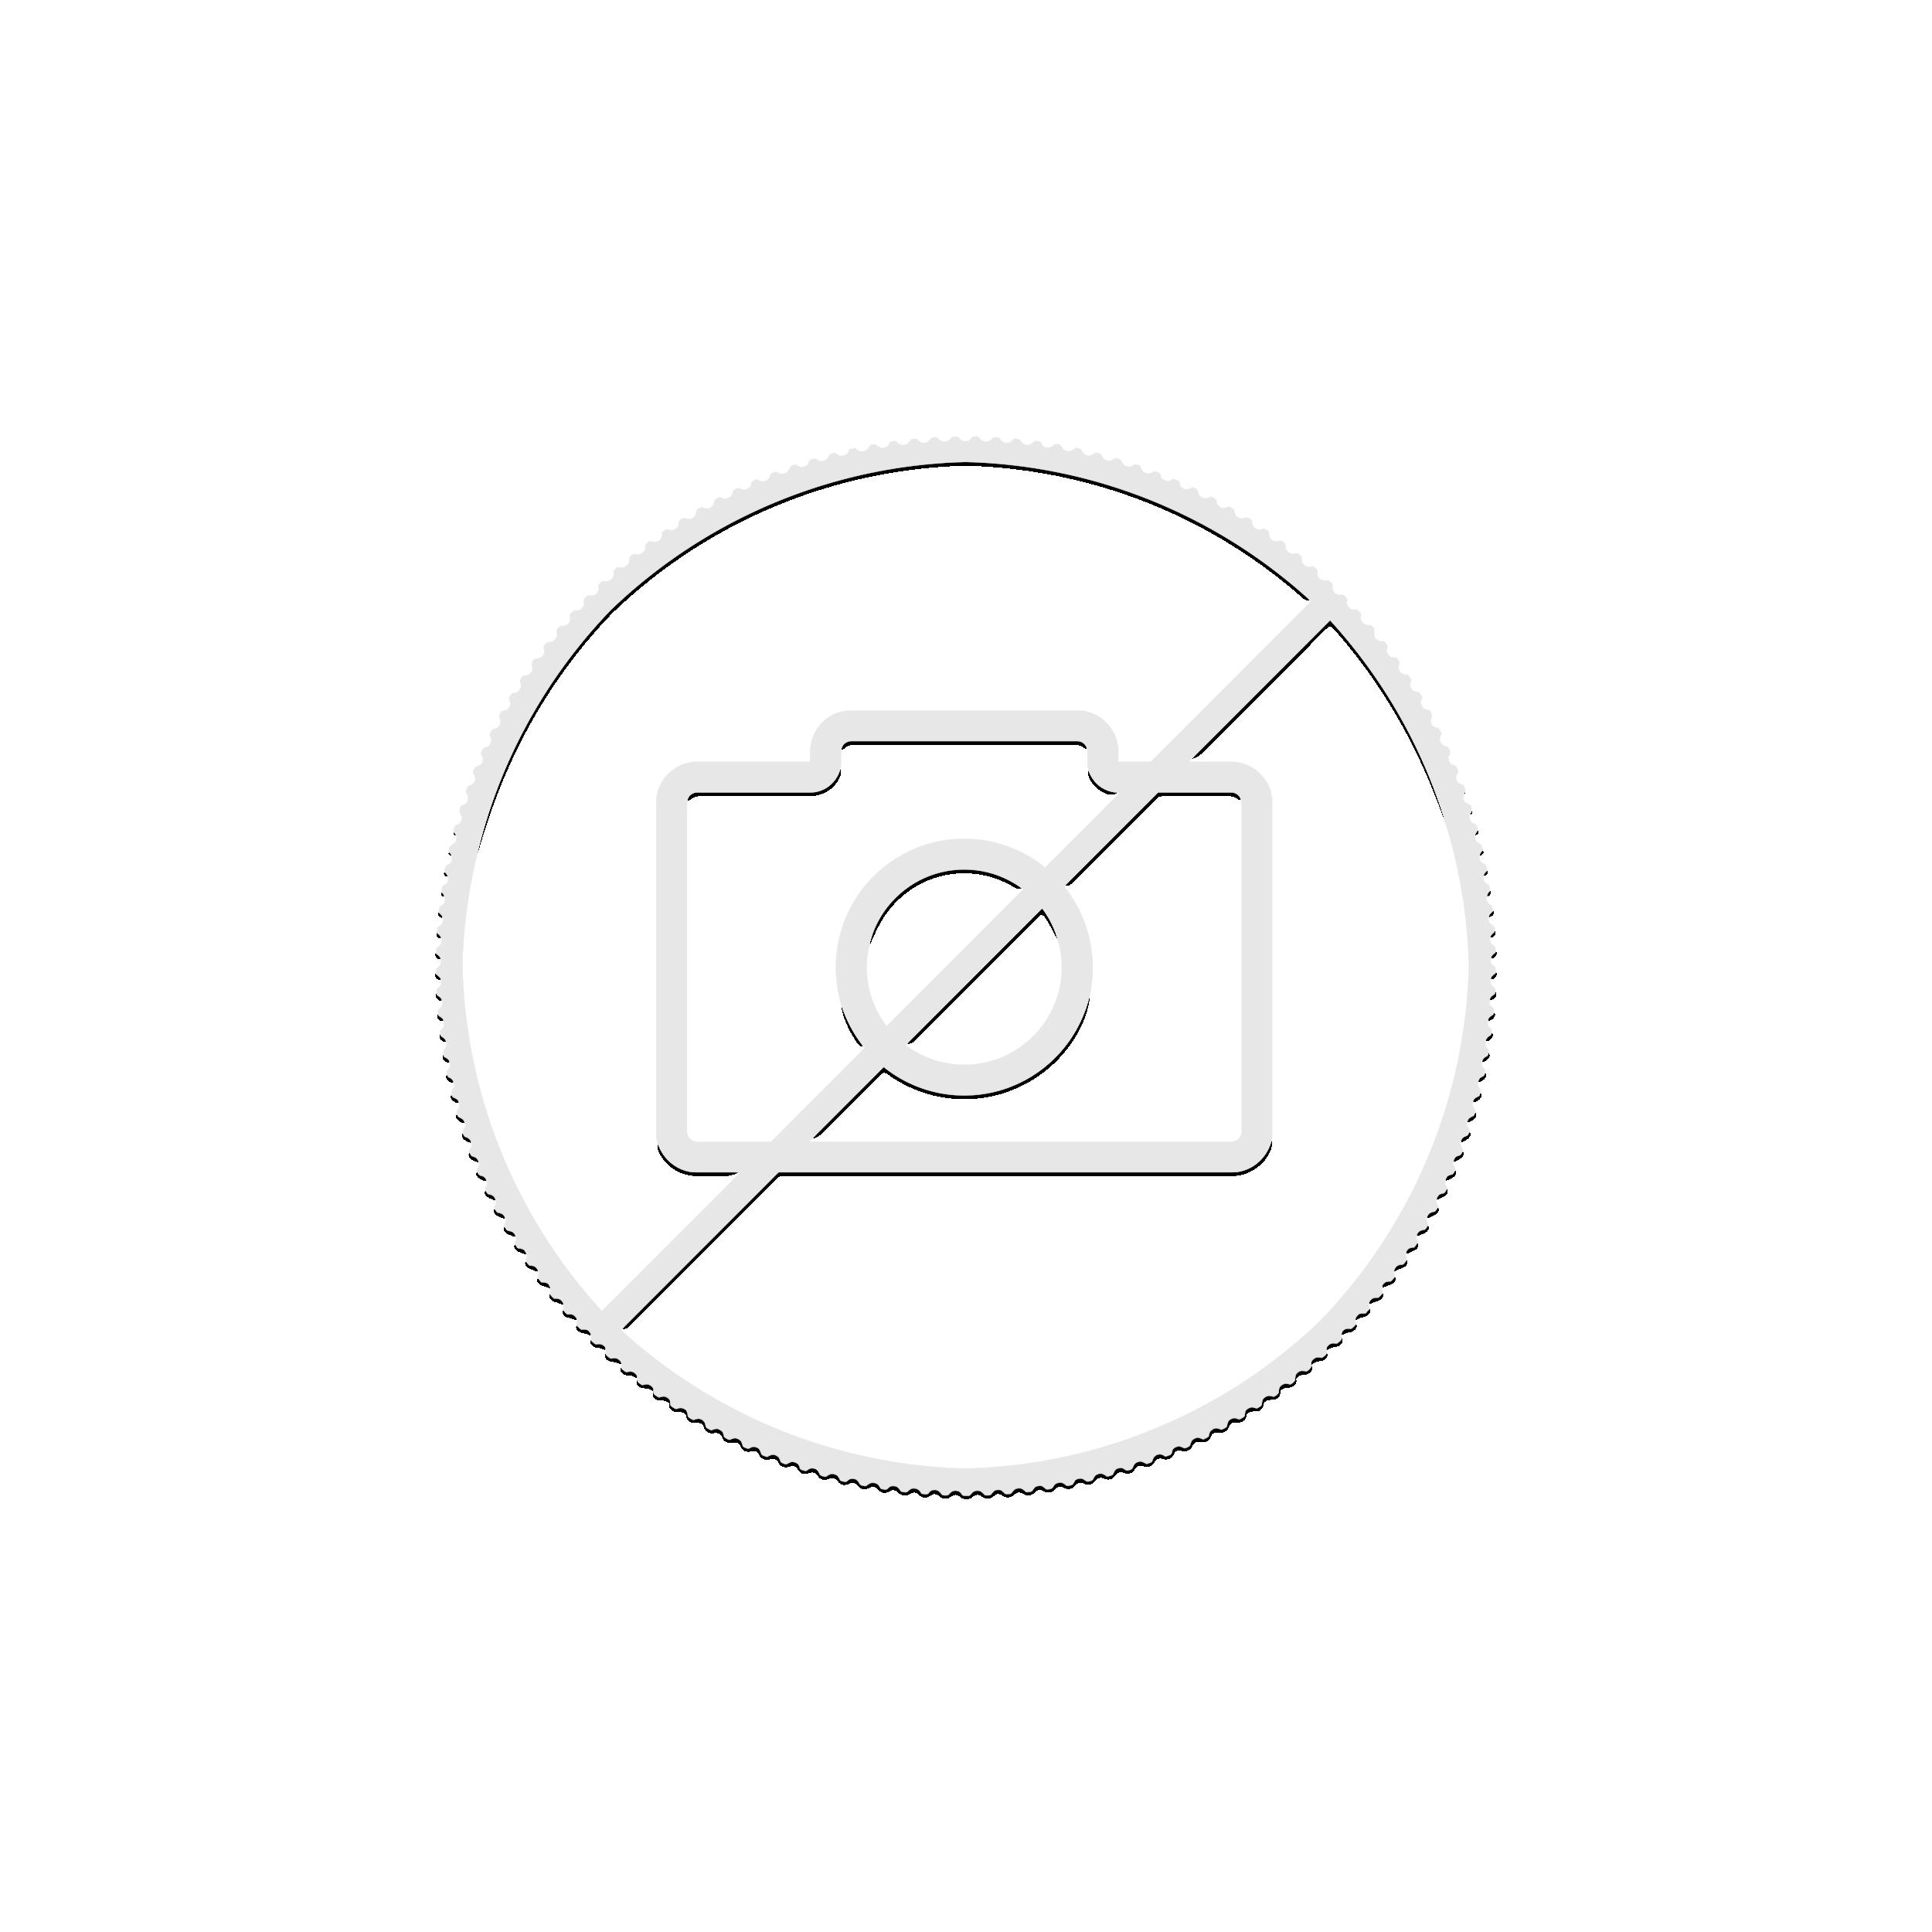 1 Kilo Kookaburra Silver Coin 2010 Buy Gold And Silver Online